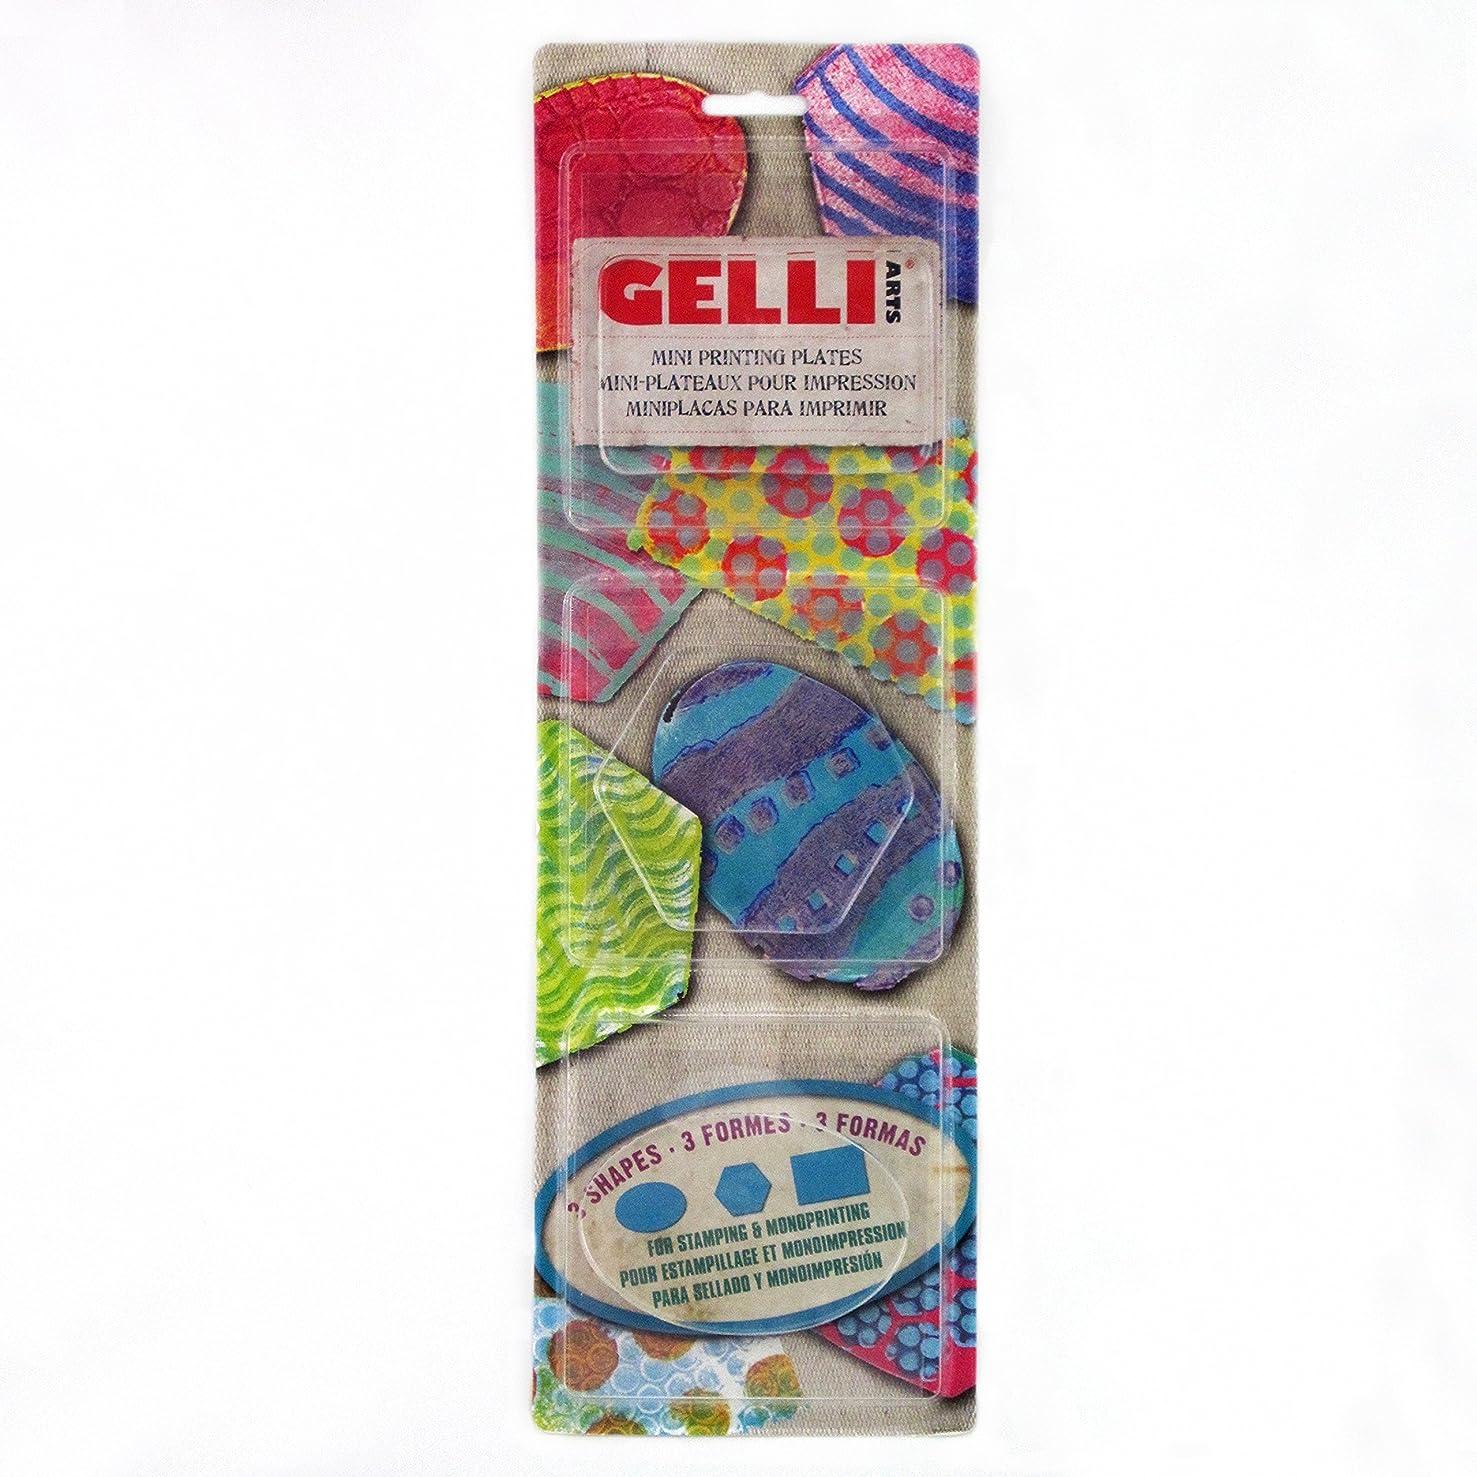 Gelli Arts Gel Prntng Plate Minis Rct Ovl Hex